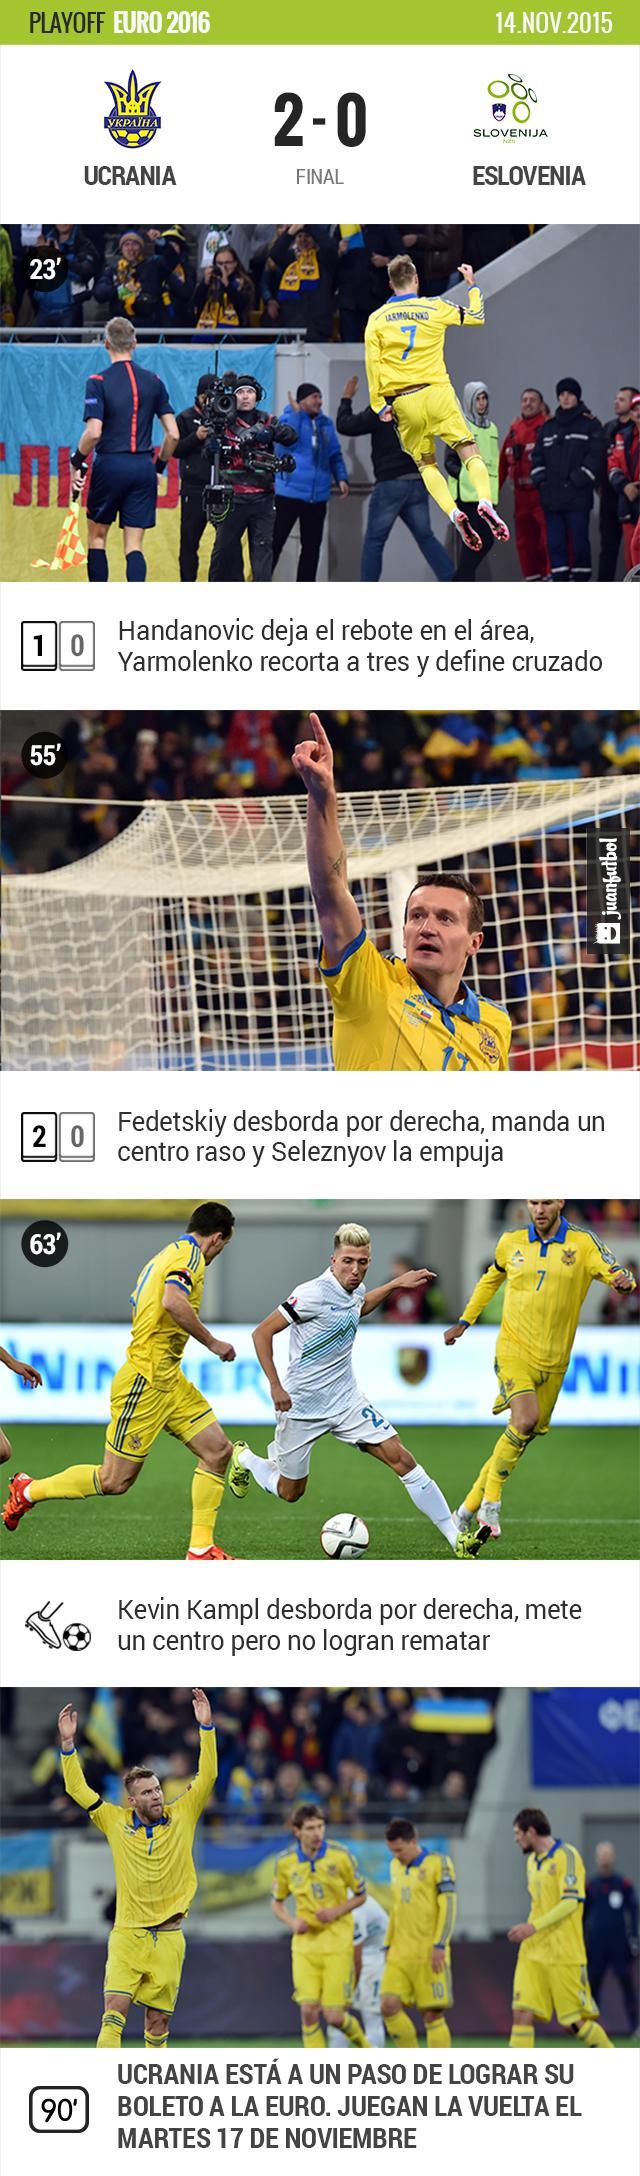 Ucrania vence en casa 2-0 a Eslovenia y se acerca a la Euro 2016.